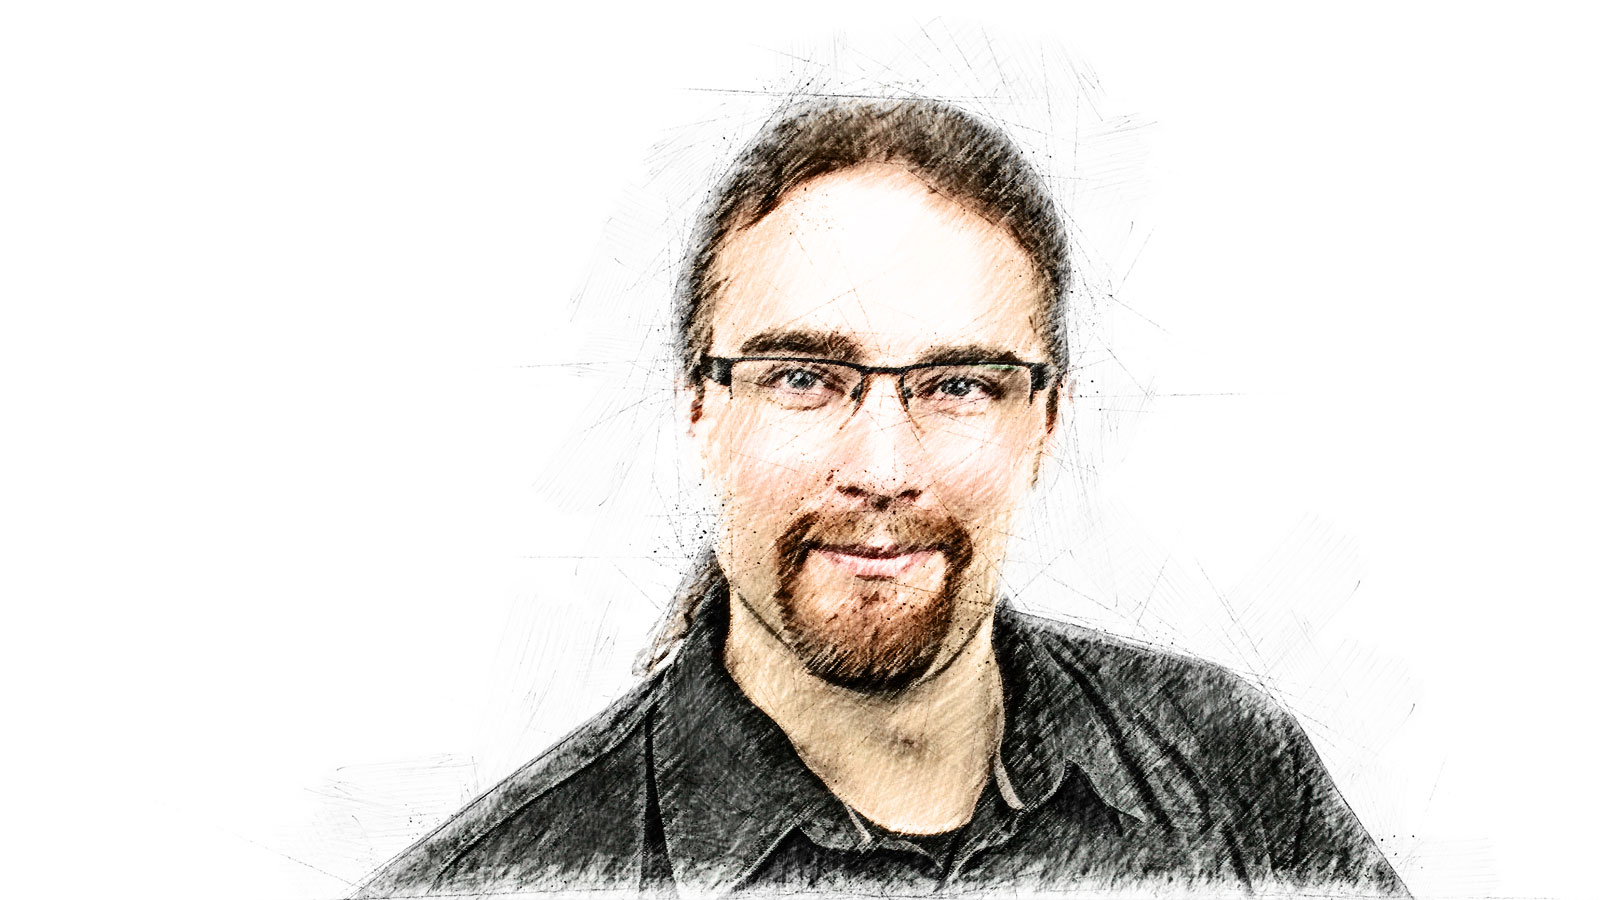 Sven Bensmann, Migazin, Kolumne, bensmann kolumne